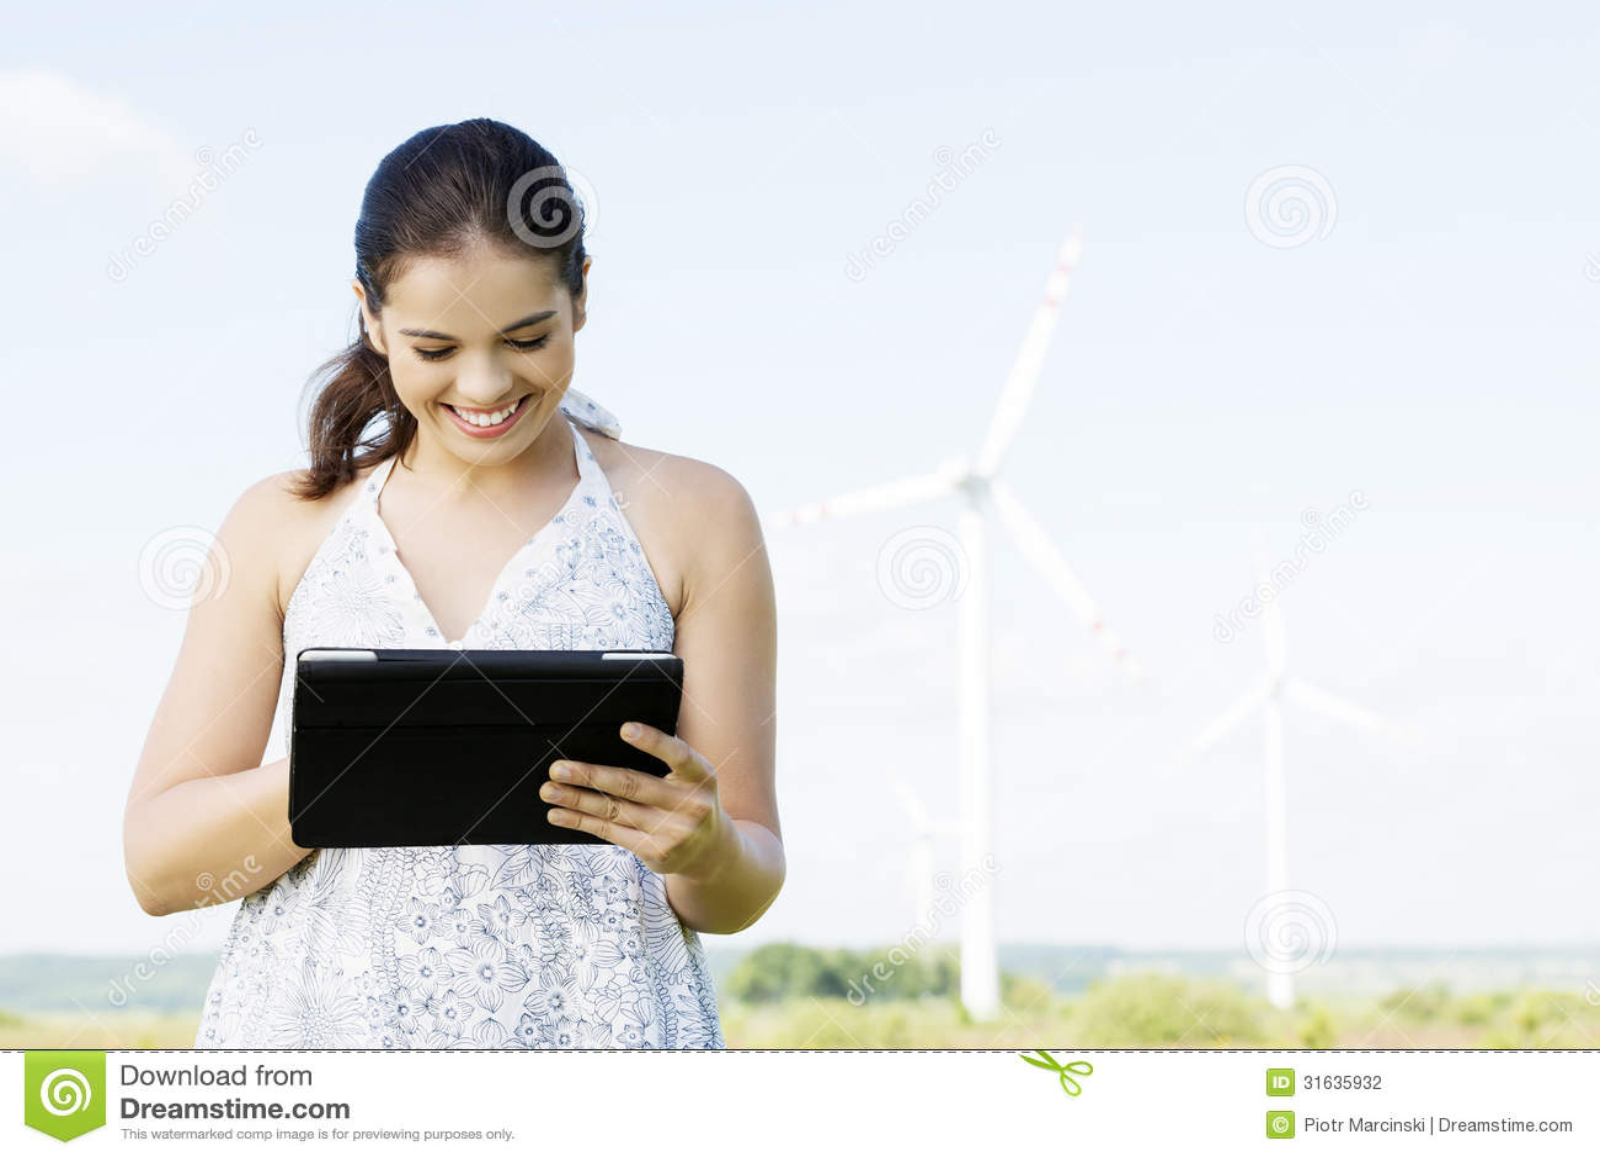 teen girl next to wind turbine